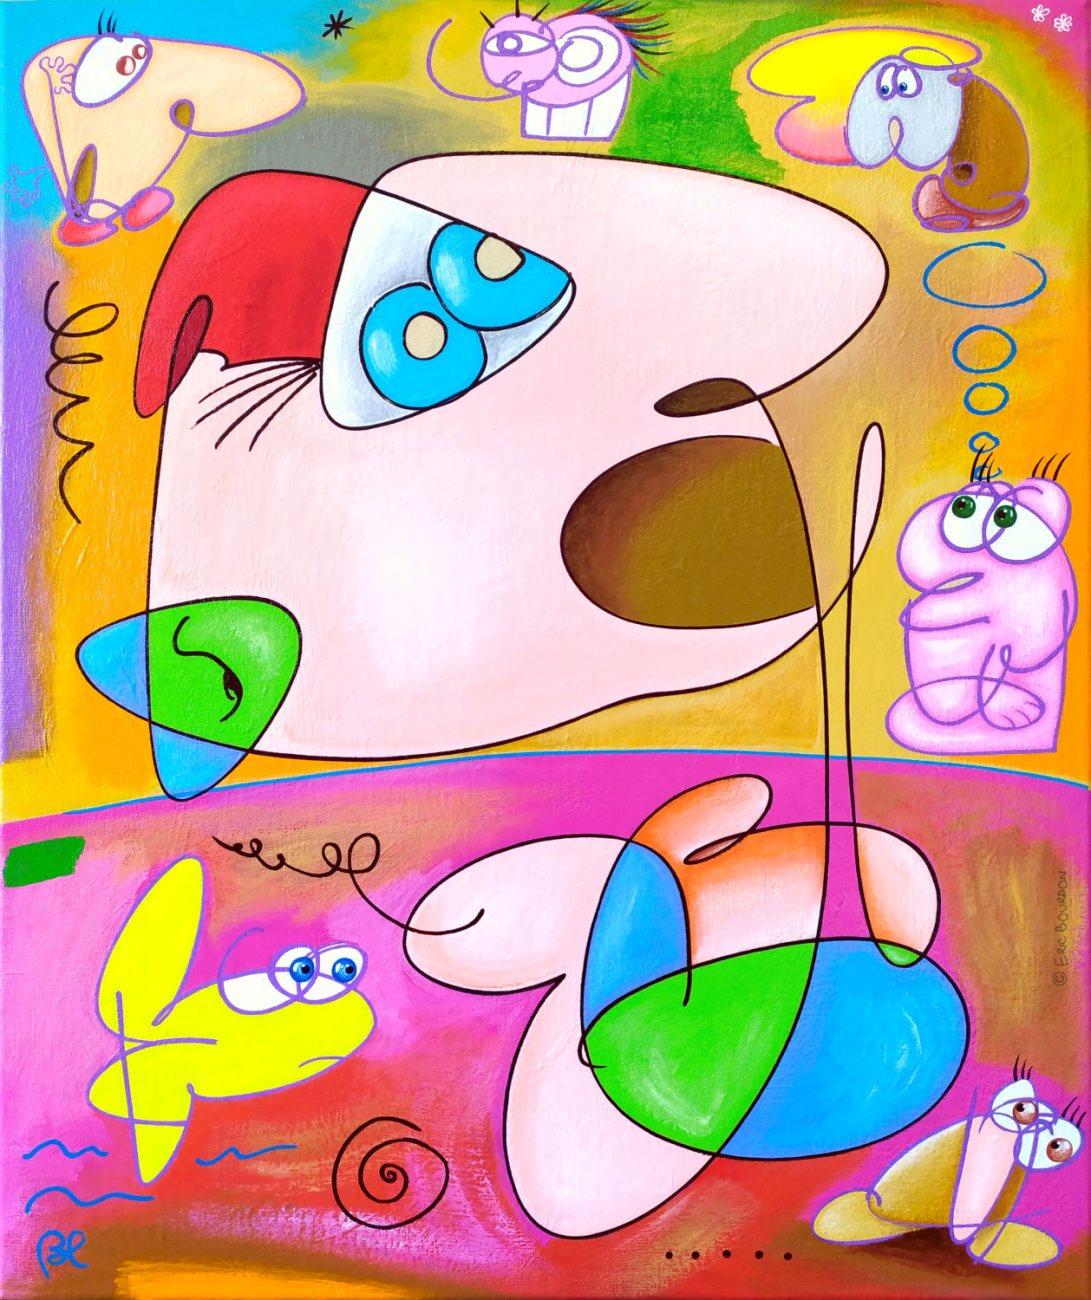 Dumb-Art-65x54cm-Acrylic-painting-by-Eric-Bourdon